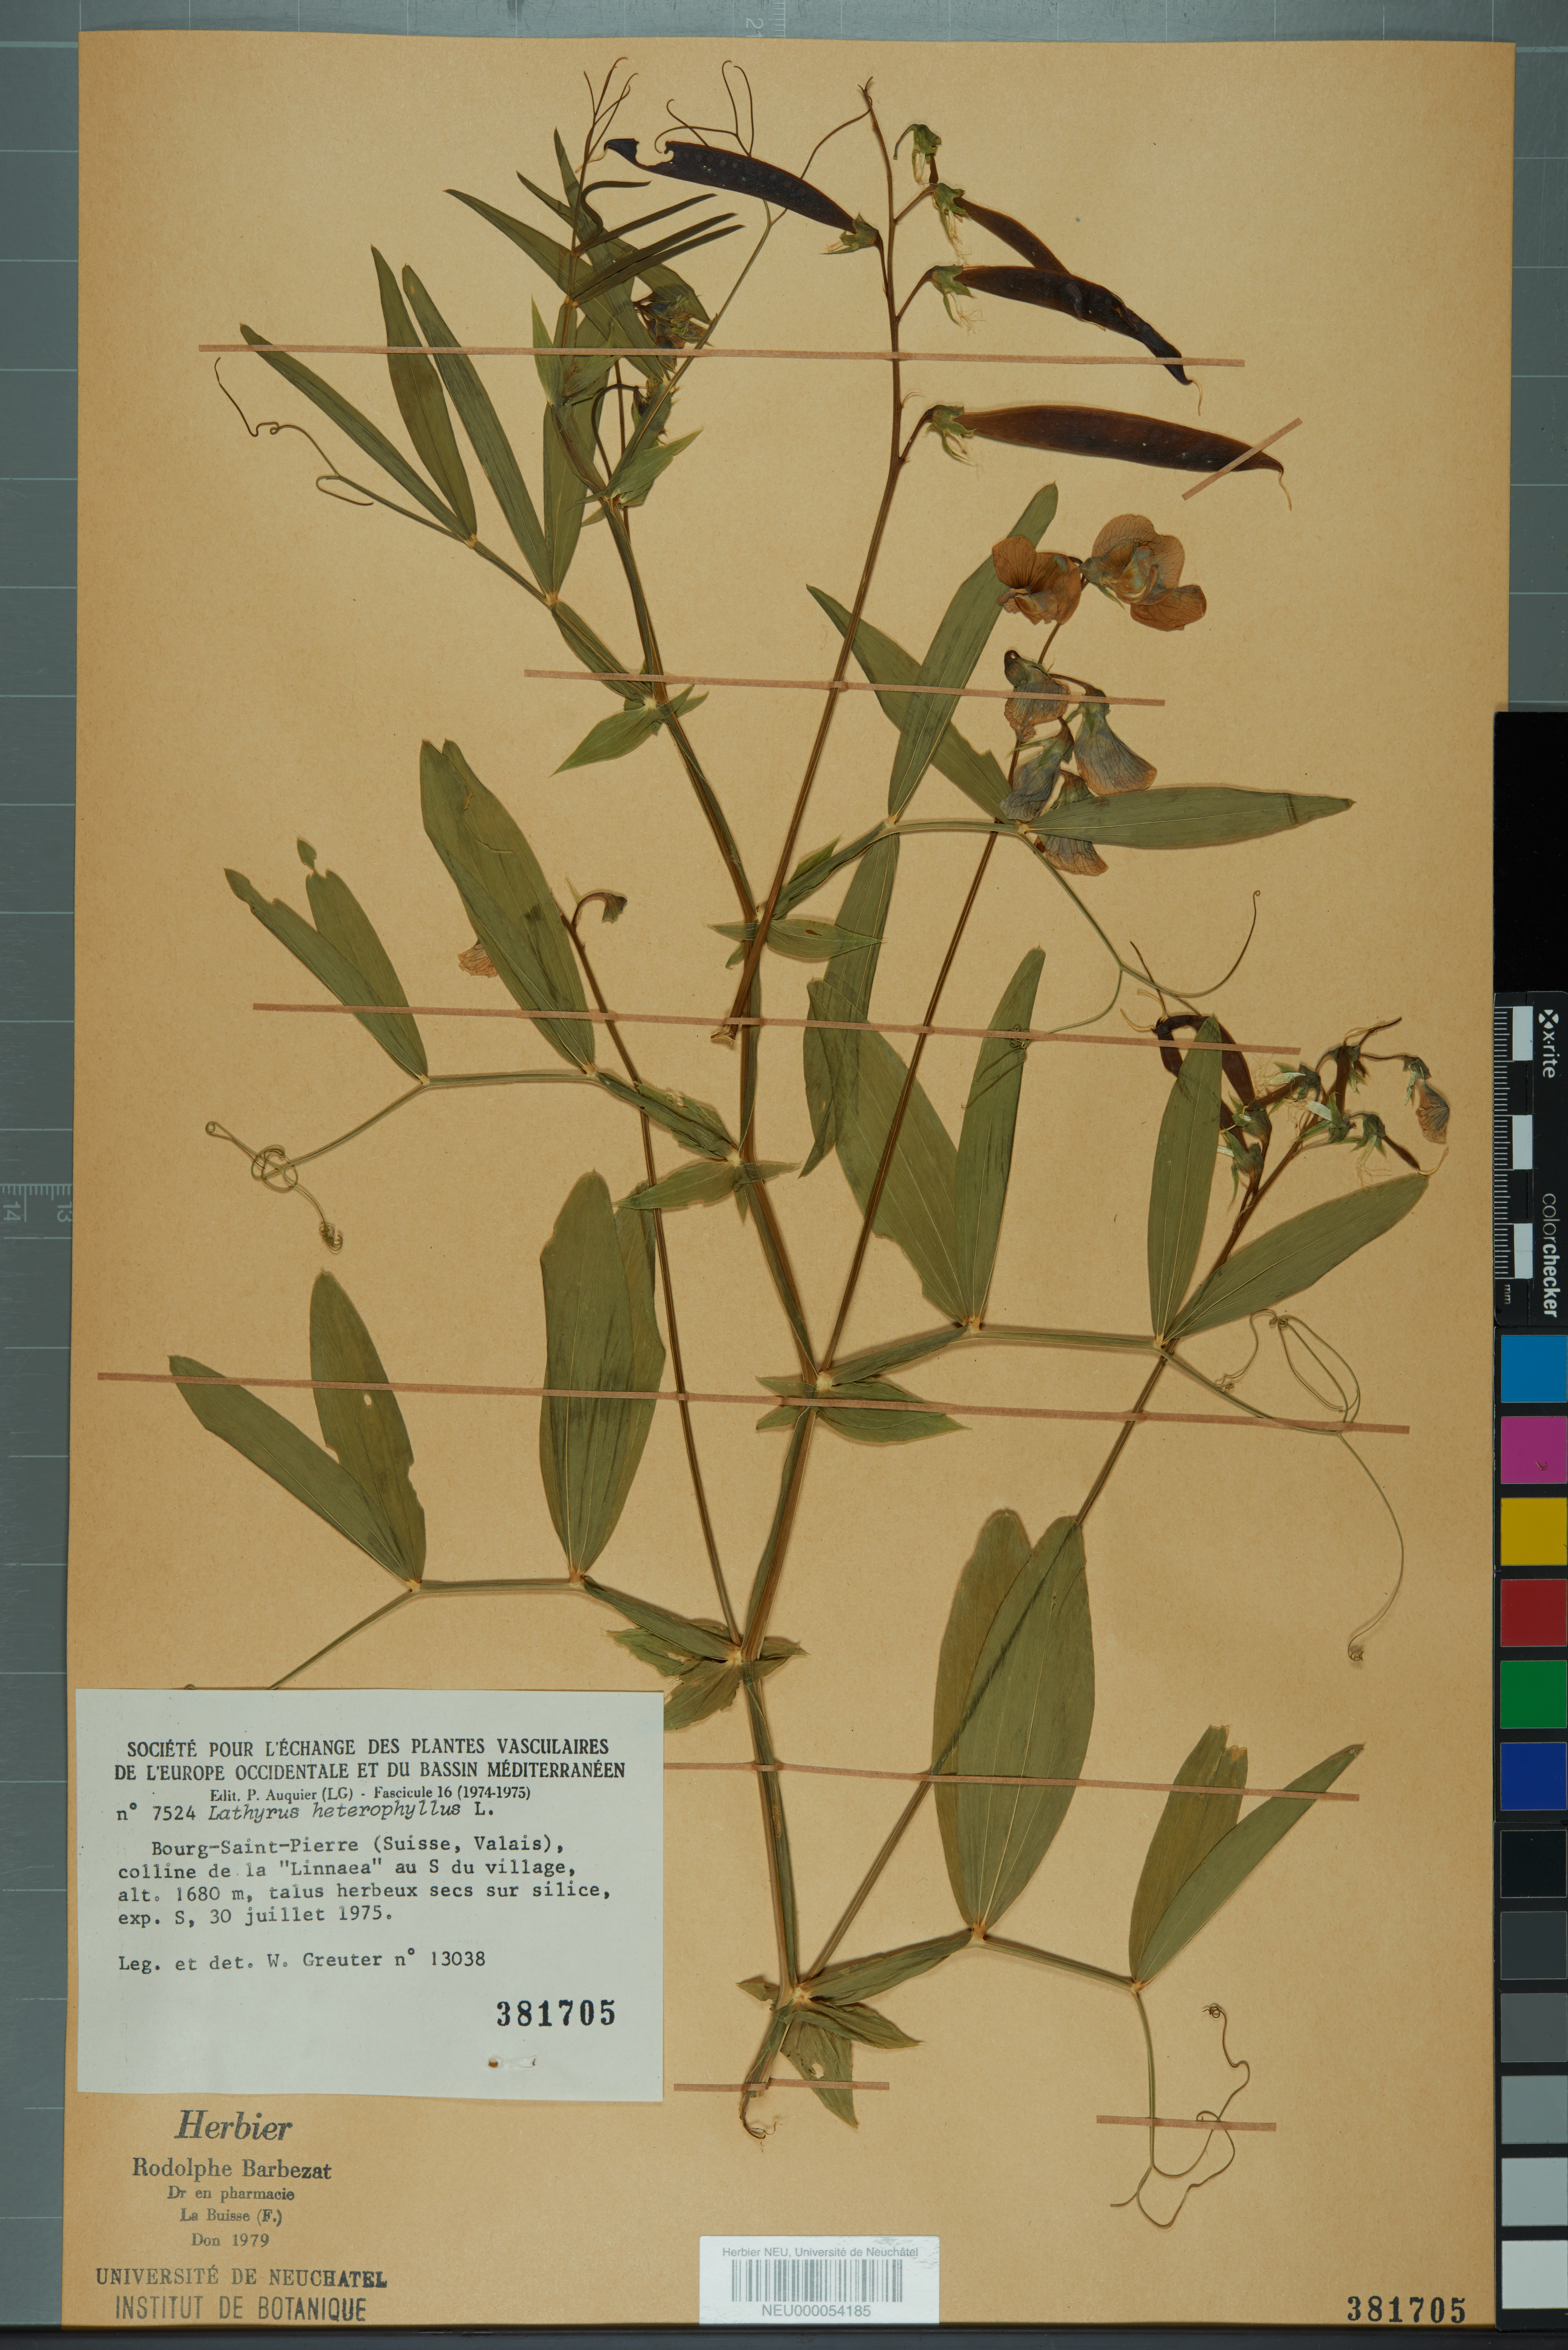 Plantes Pour Talus Sec file:neuchâtel herbarium - lathyrus heterophyllus